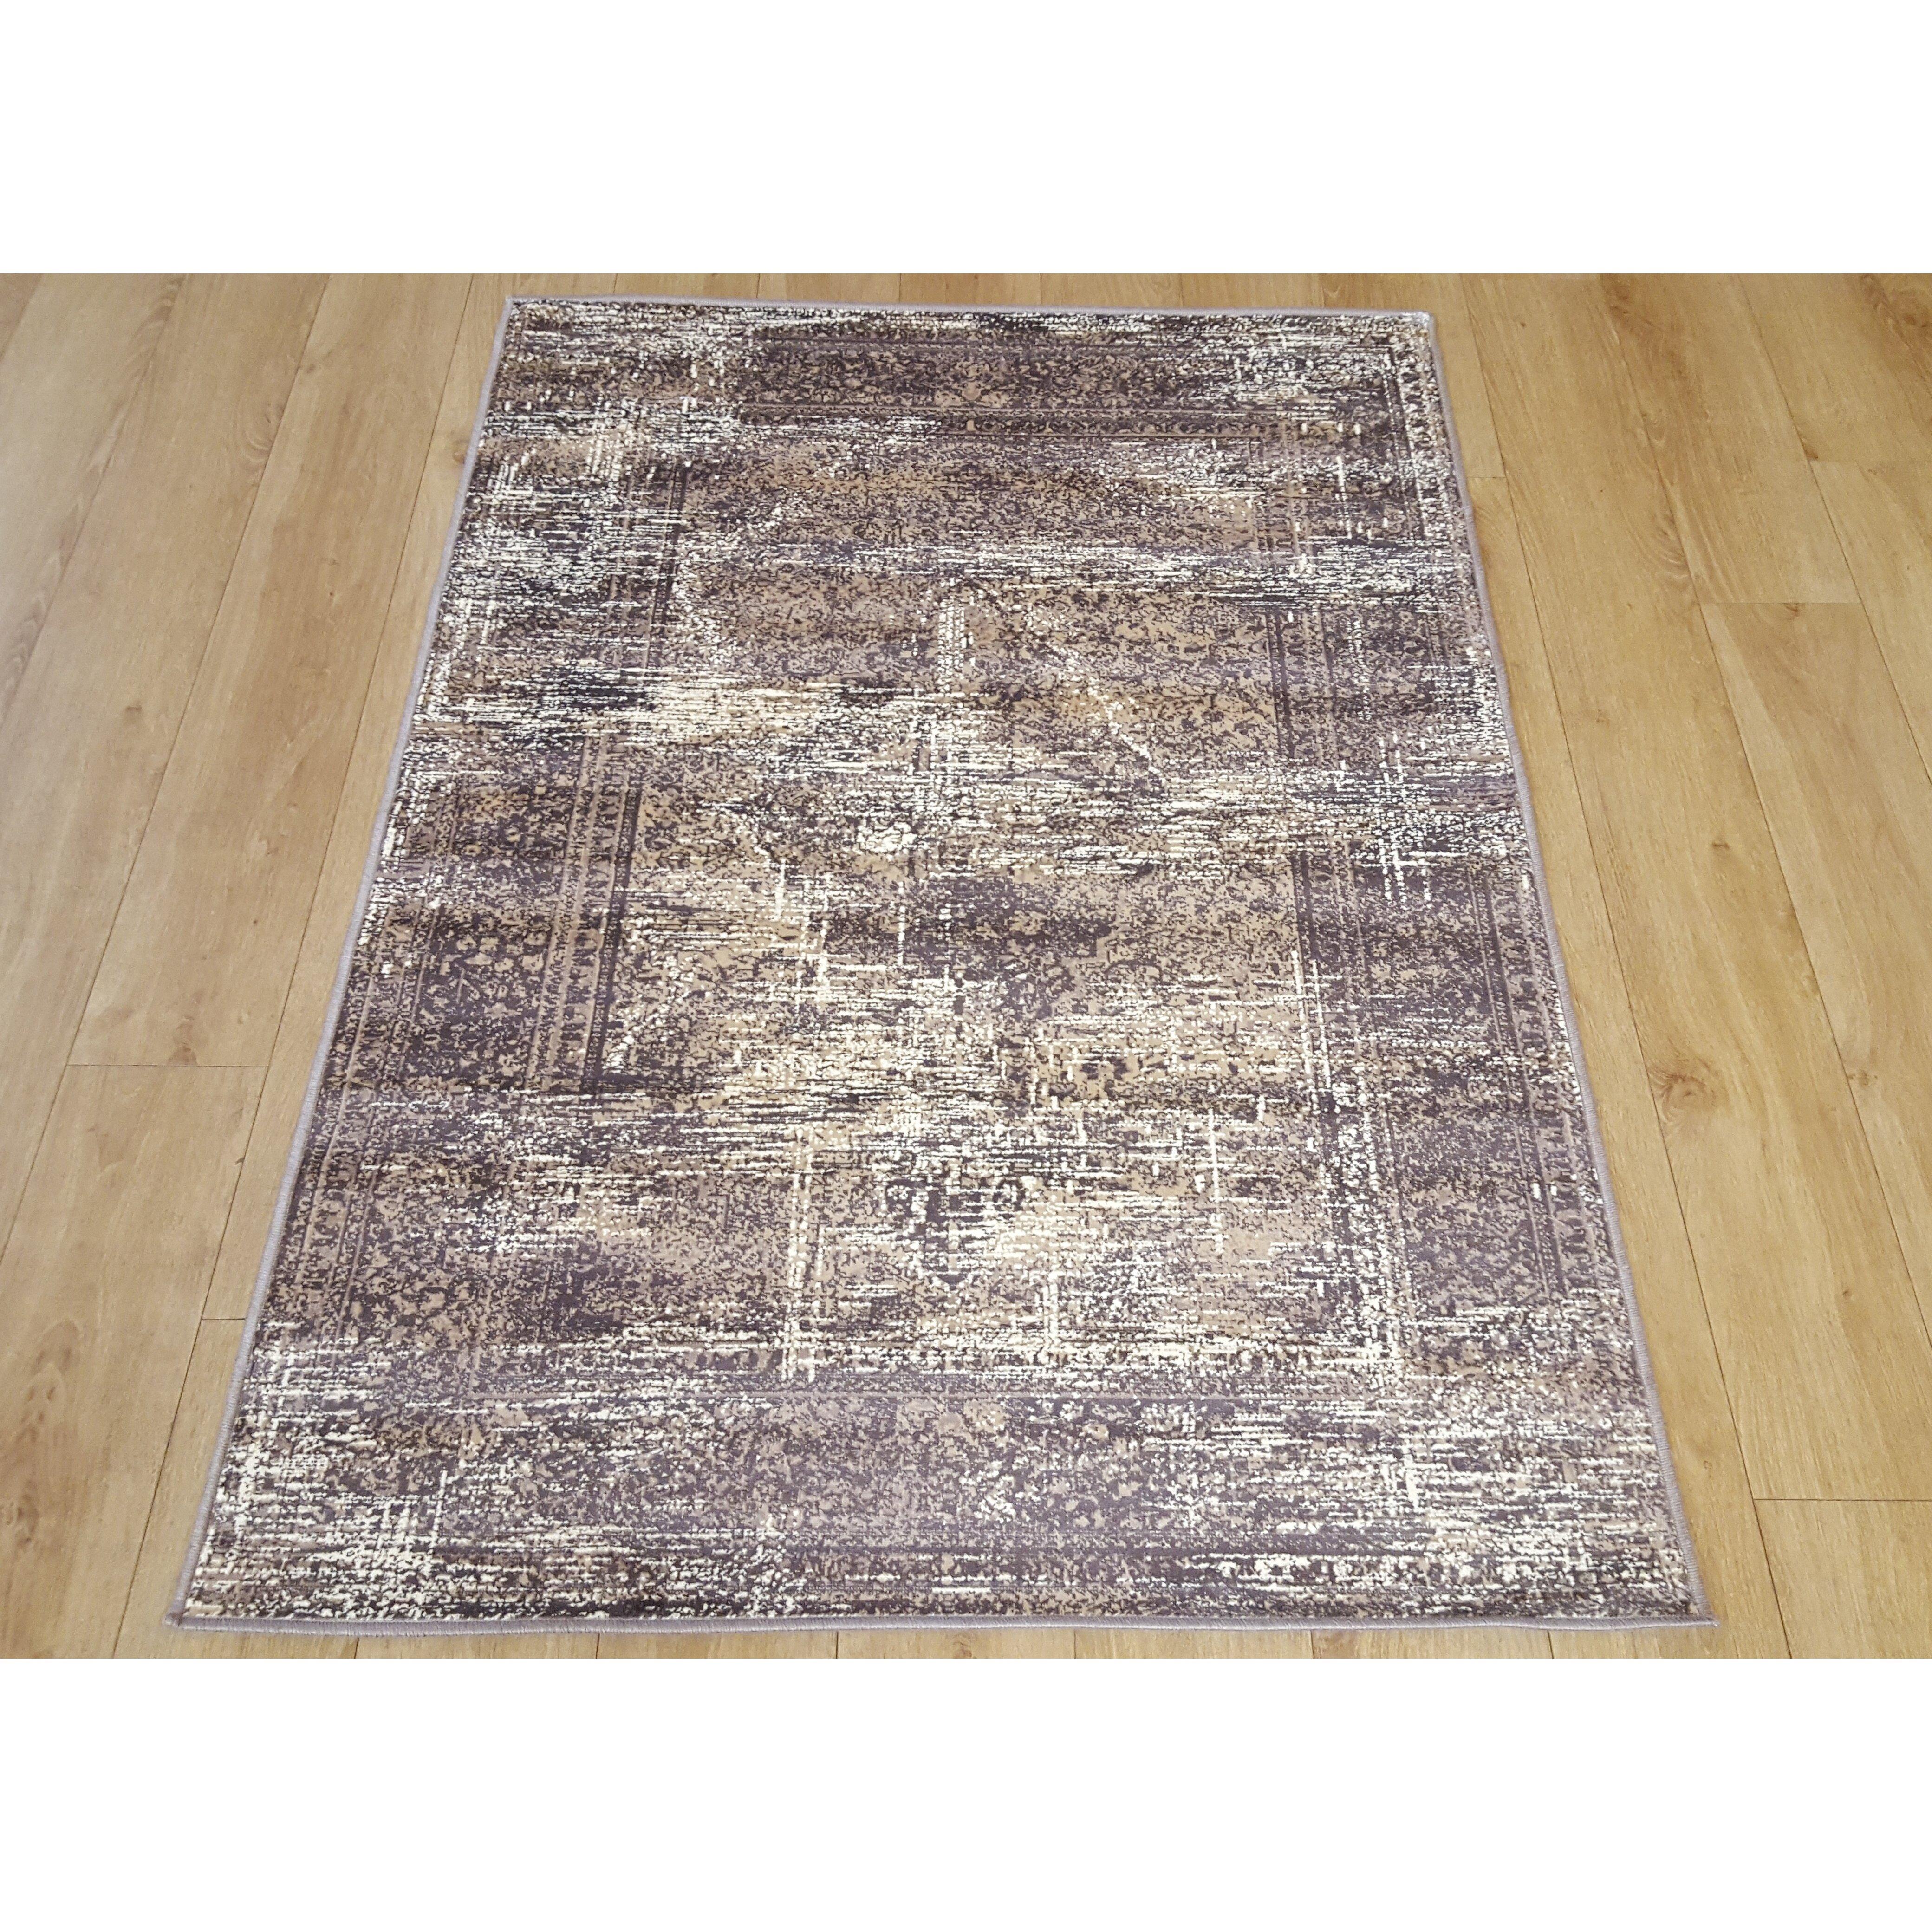 Barefoot Artsilk Rugs Teppich Persian Antika in Beige